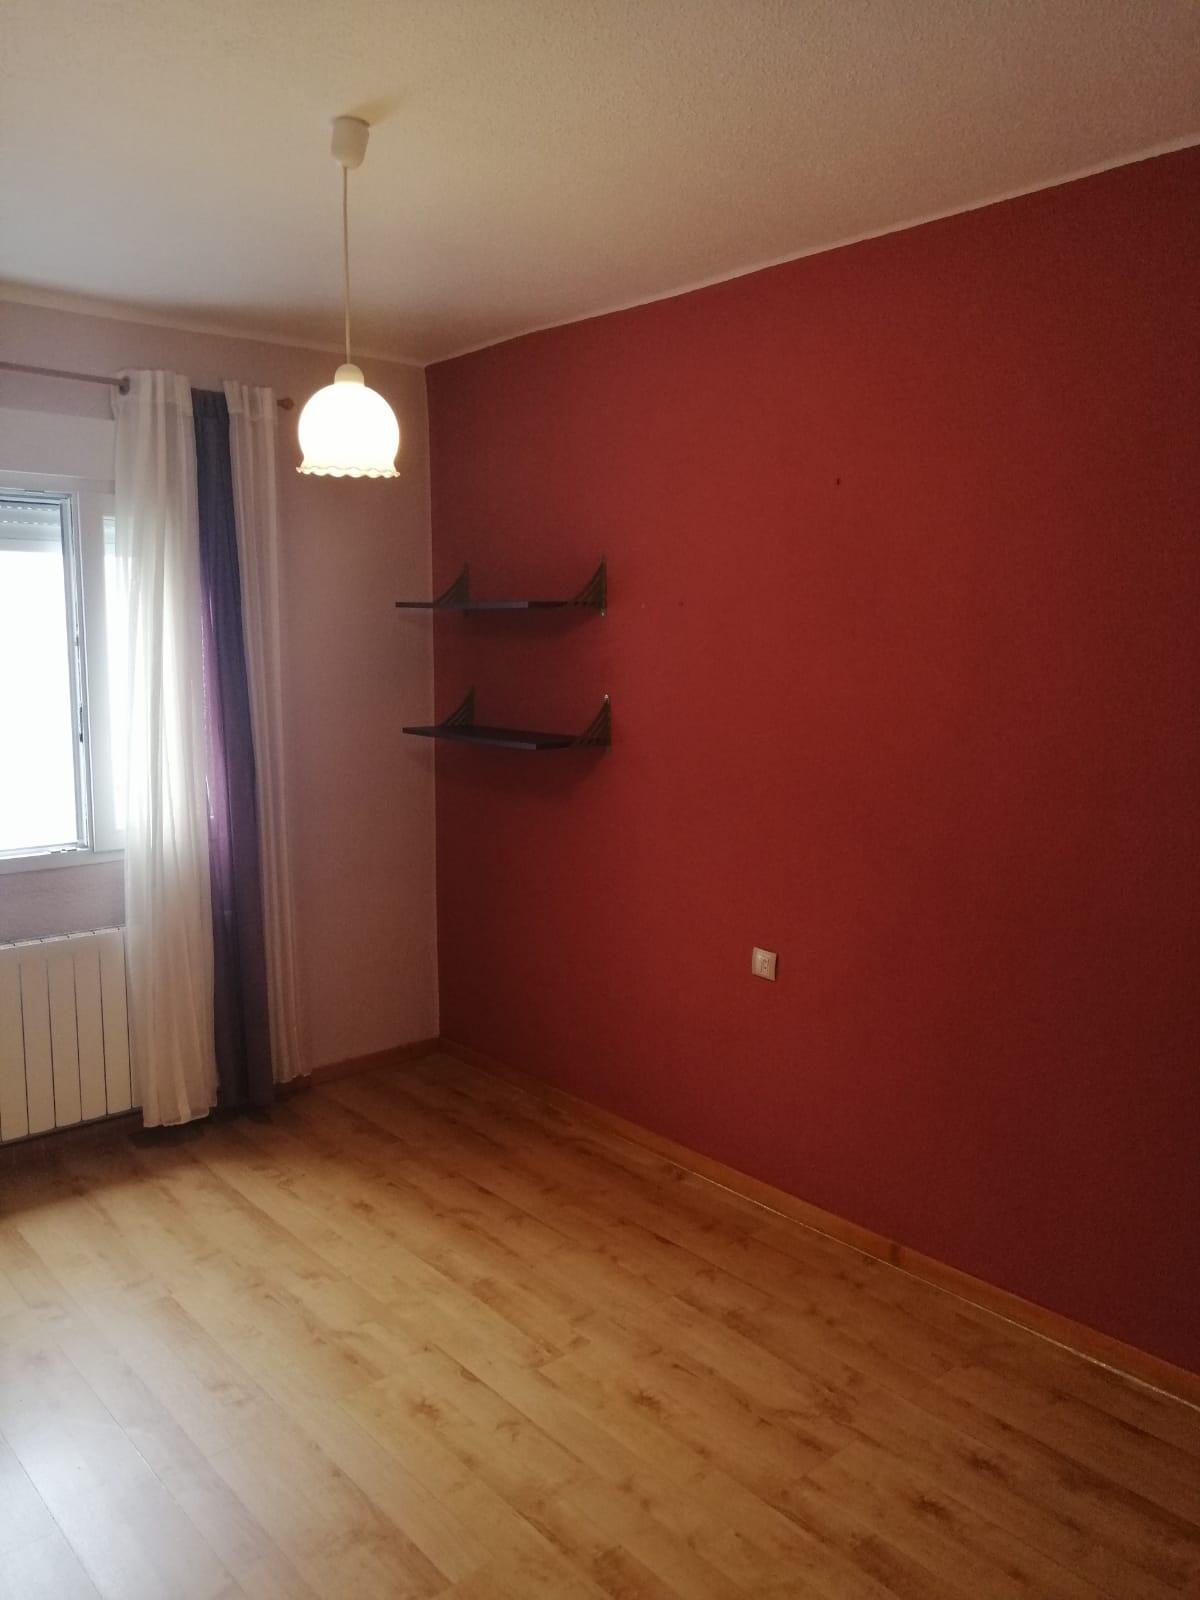 Piso de tres dormitorios junto a corte inglés (REF: 53) - foto 13 bd938f75-8c3d-4378-aeb0-5c723c89abb7.jpg